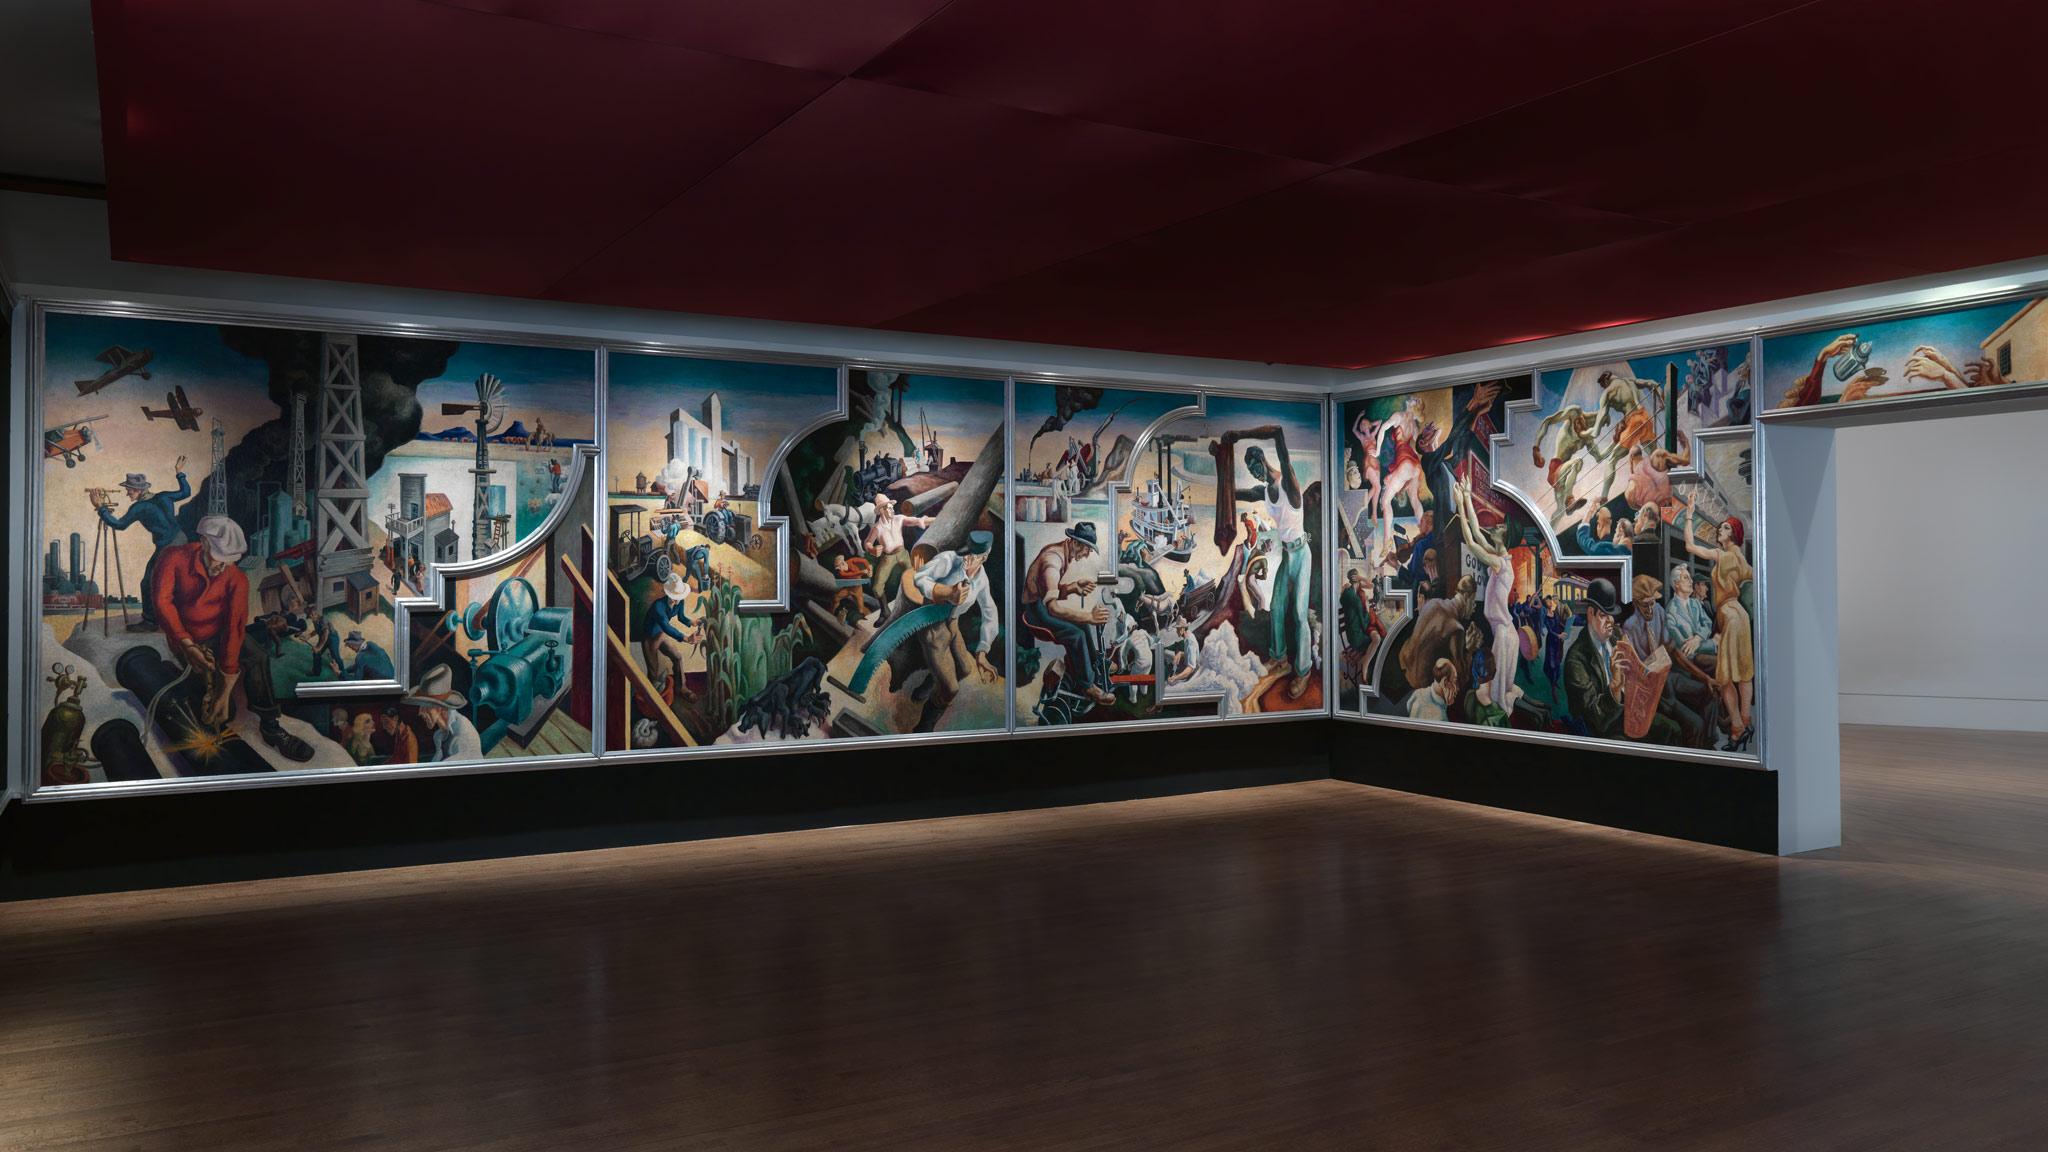 The history blog 2014 november 21 for America today mural